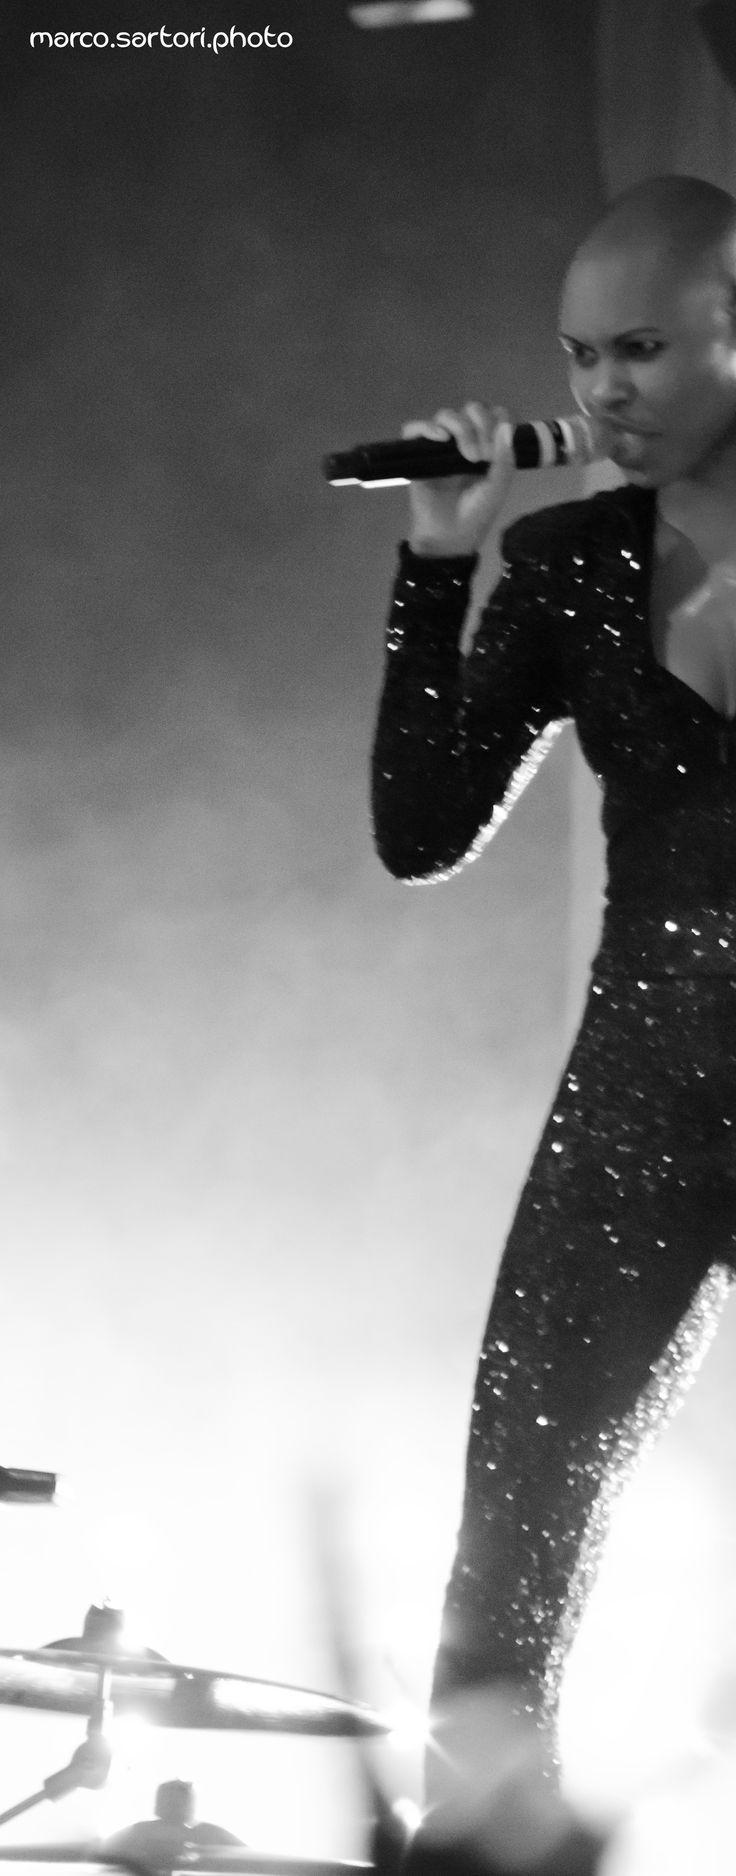 Skunk Anansie live @ Ferrara Italy #skunkanansie #skin #b&w #black&white #ferrara